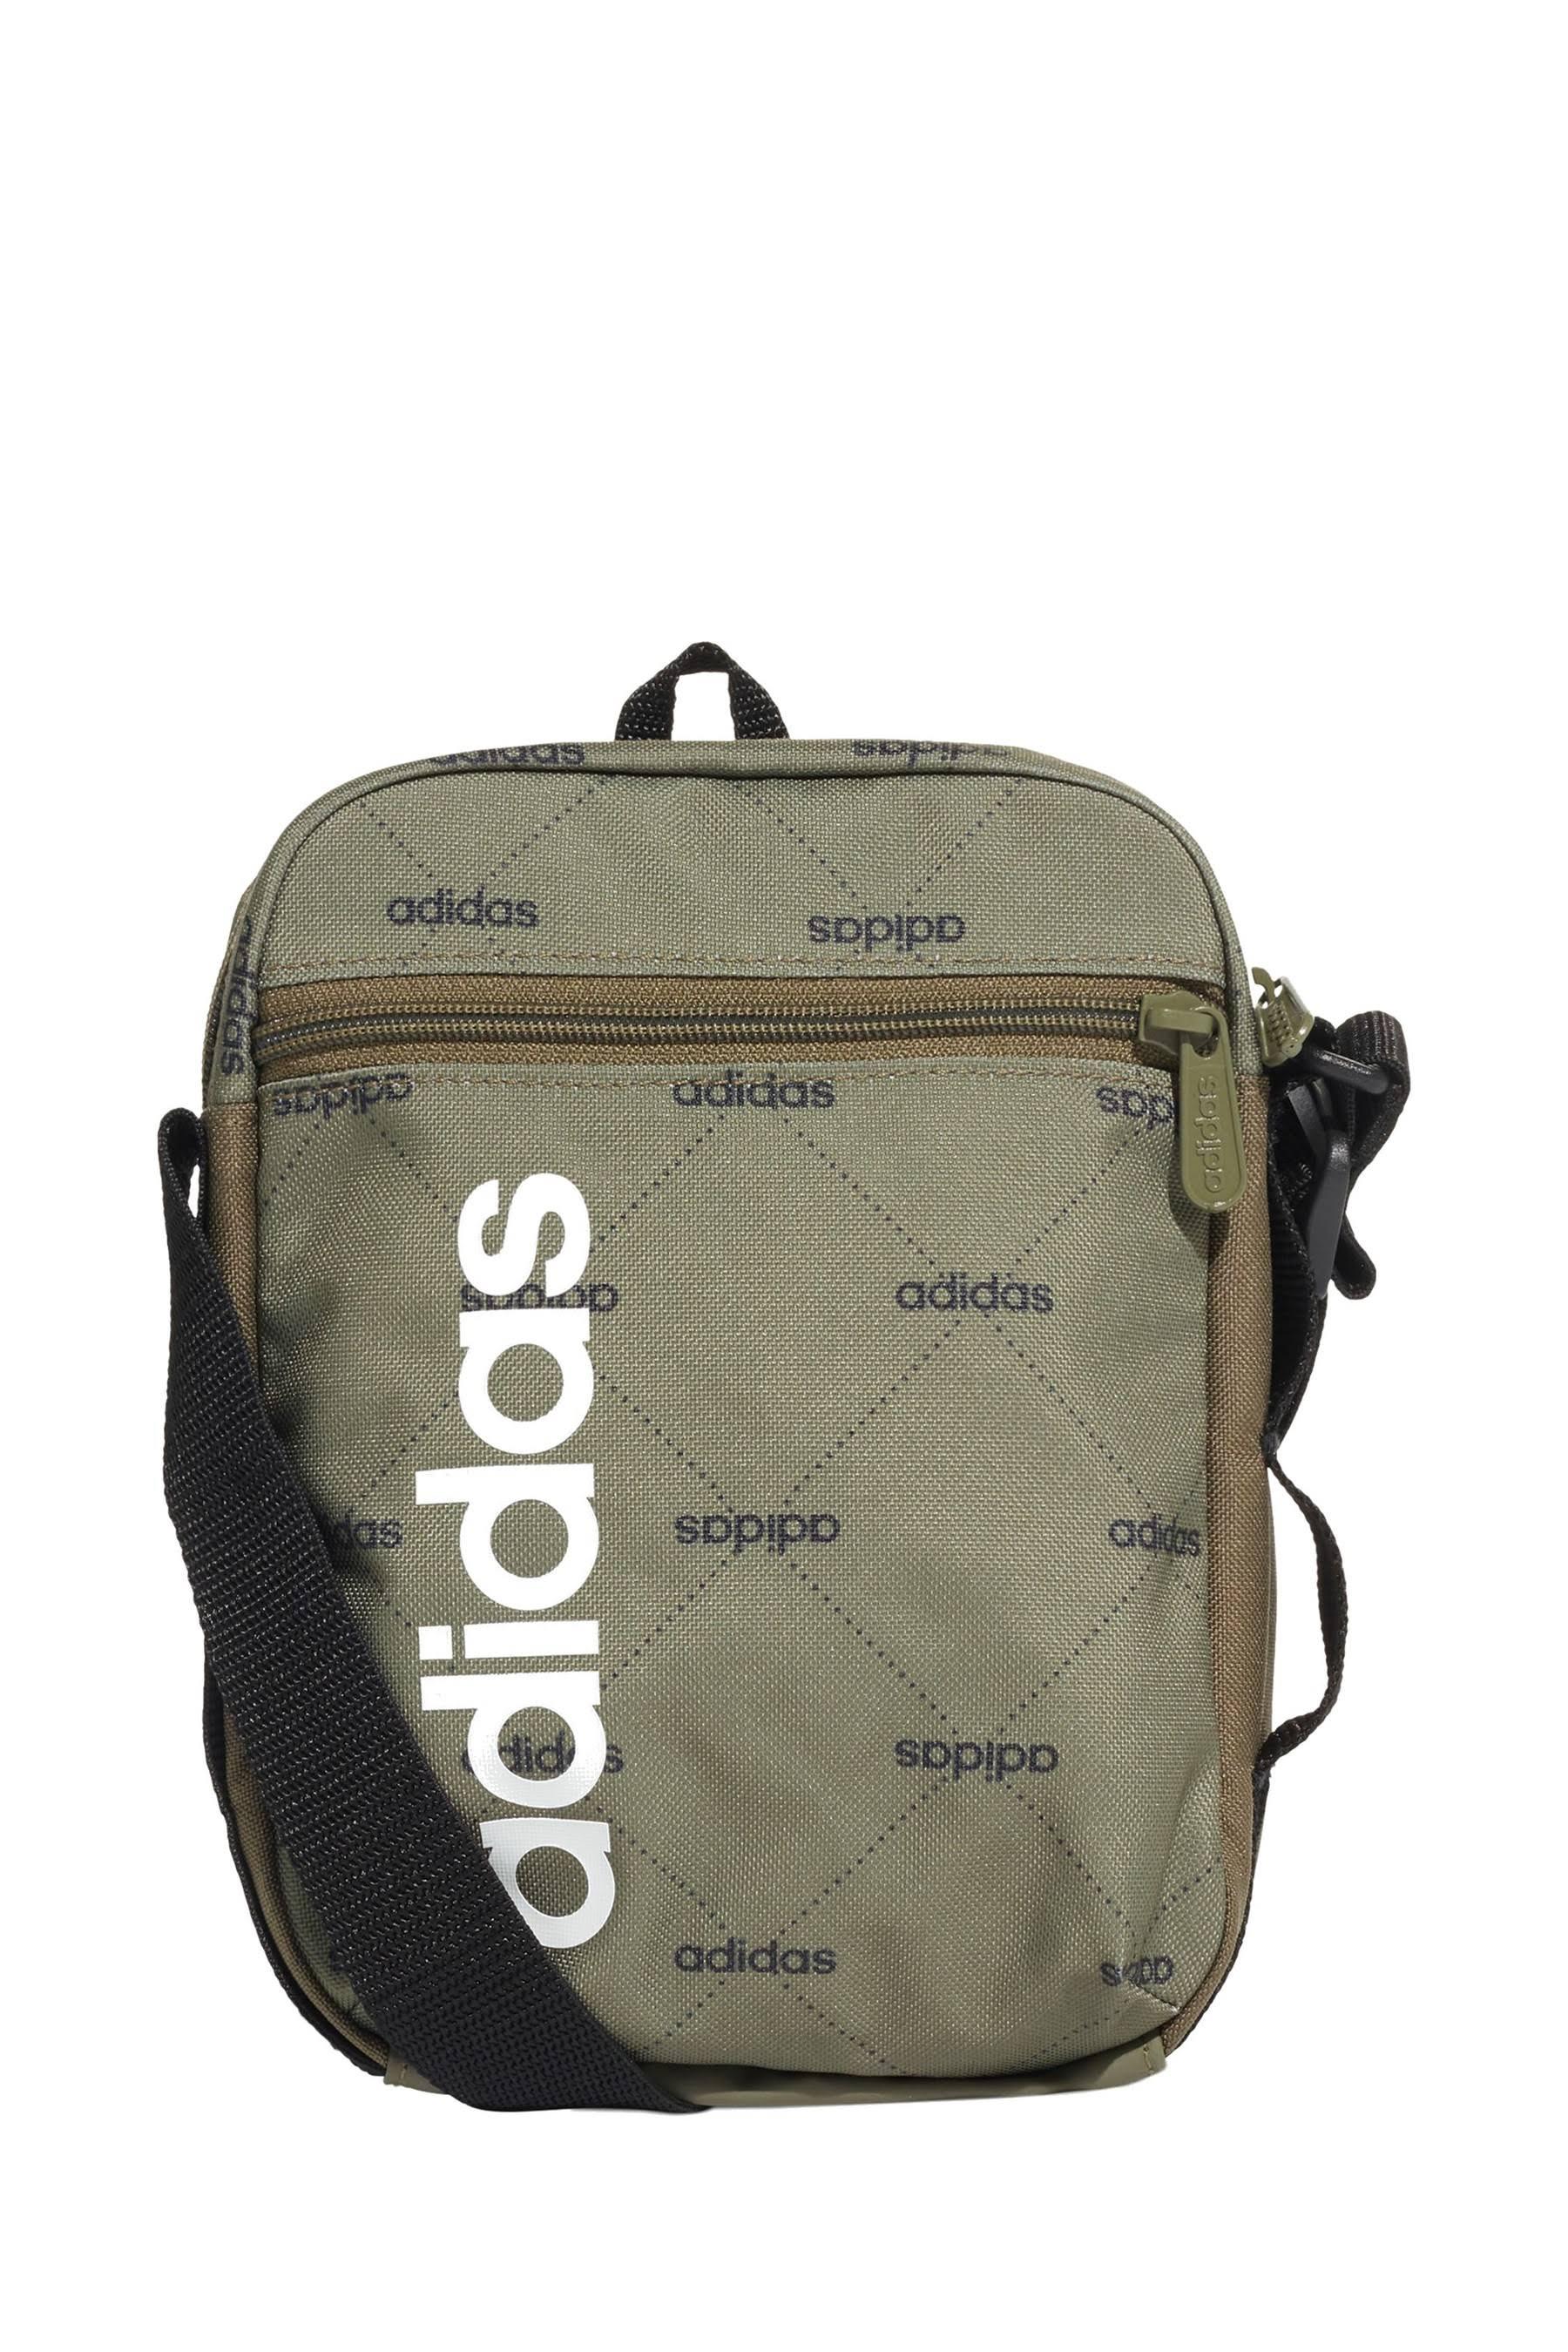 Adidas Linear Graphic Organiser Bag